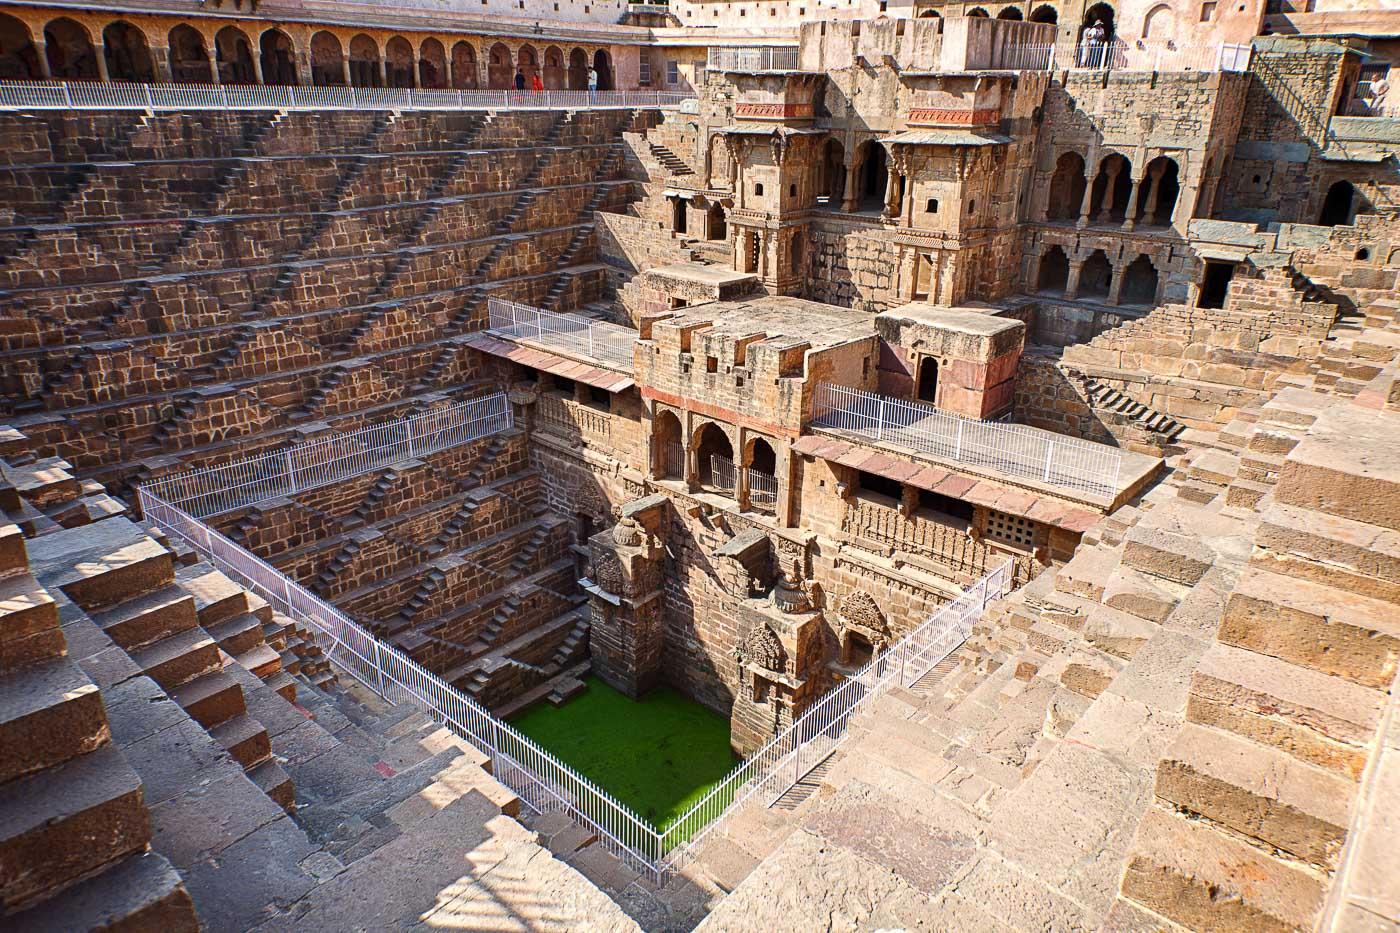 Memorable Staircase Designs - Chand Baori step well, Abhaneri, India